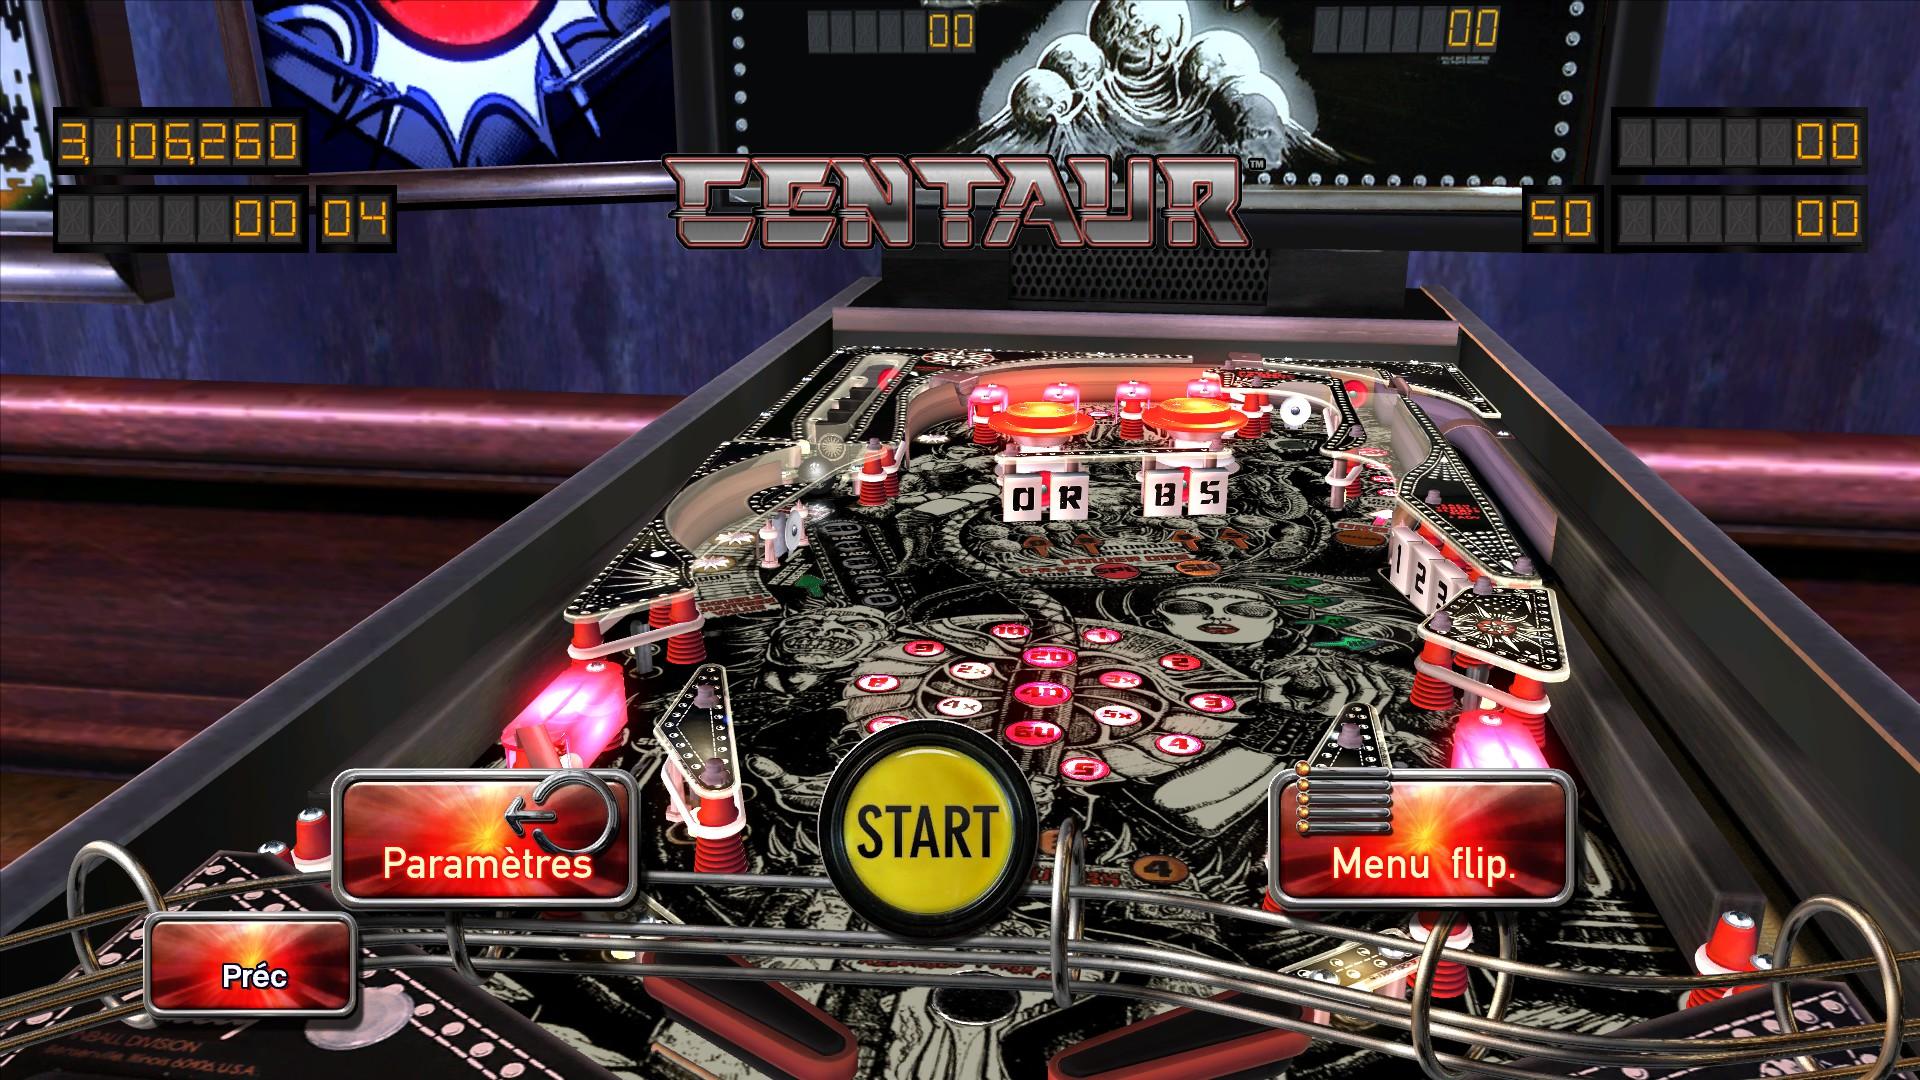 Mantalow: Pinball Arcade: Centaur (PC) 3,106,260 points on 2016-02-25 10:23:16